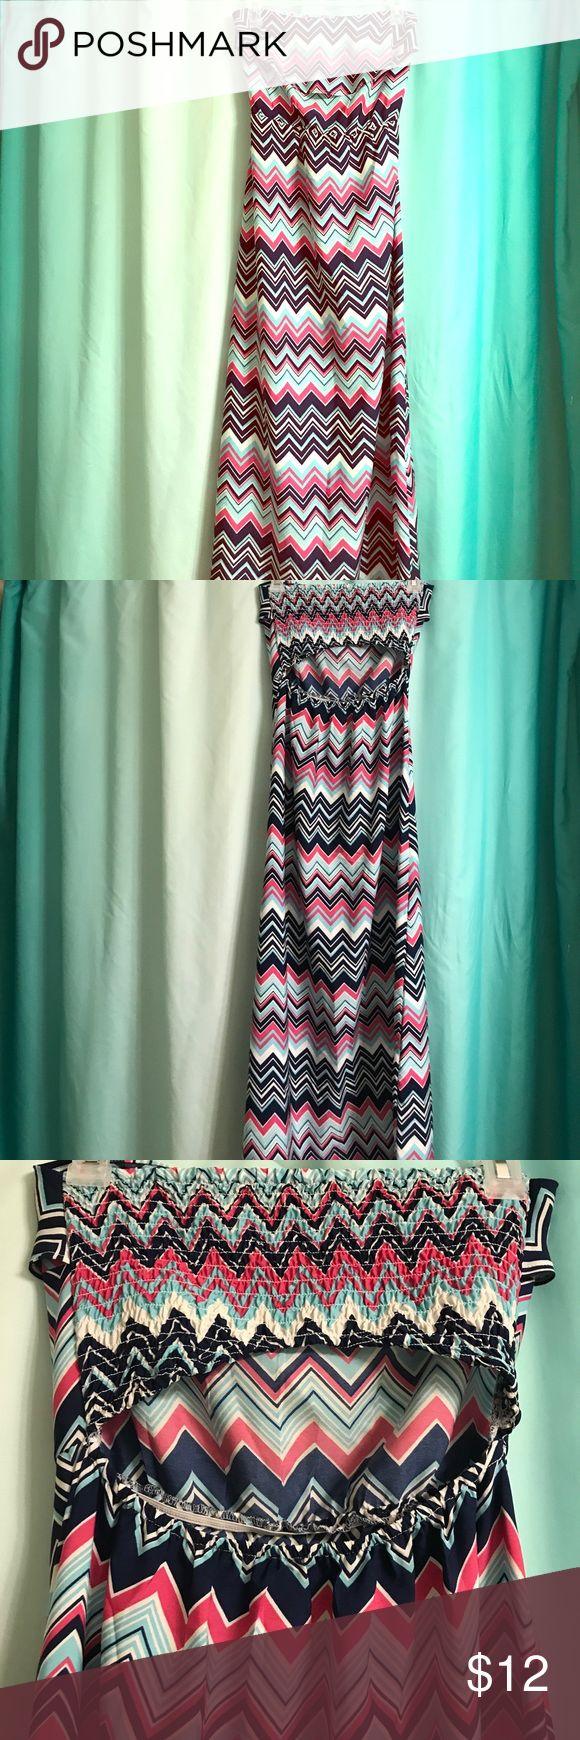 Chevron strapless maxi dress White, navy, pink, and baby blue chevron Dresses Maxi